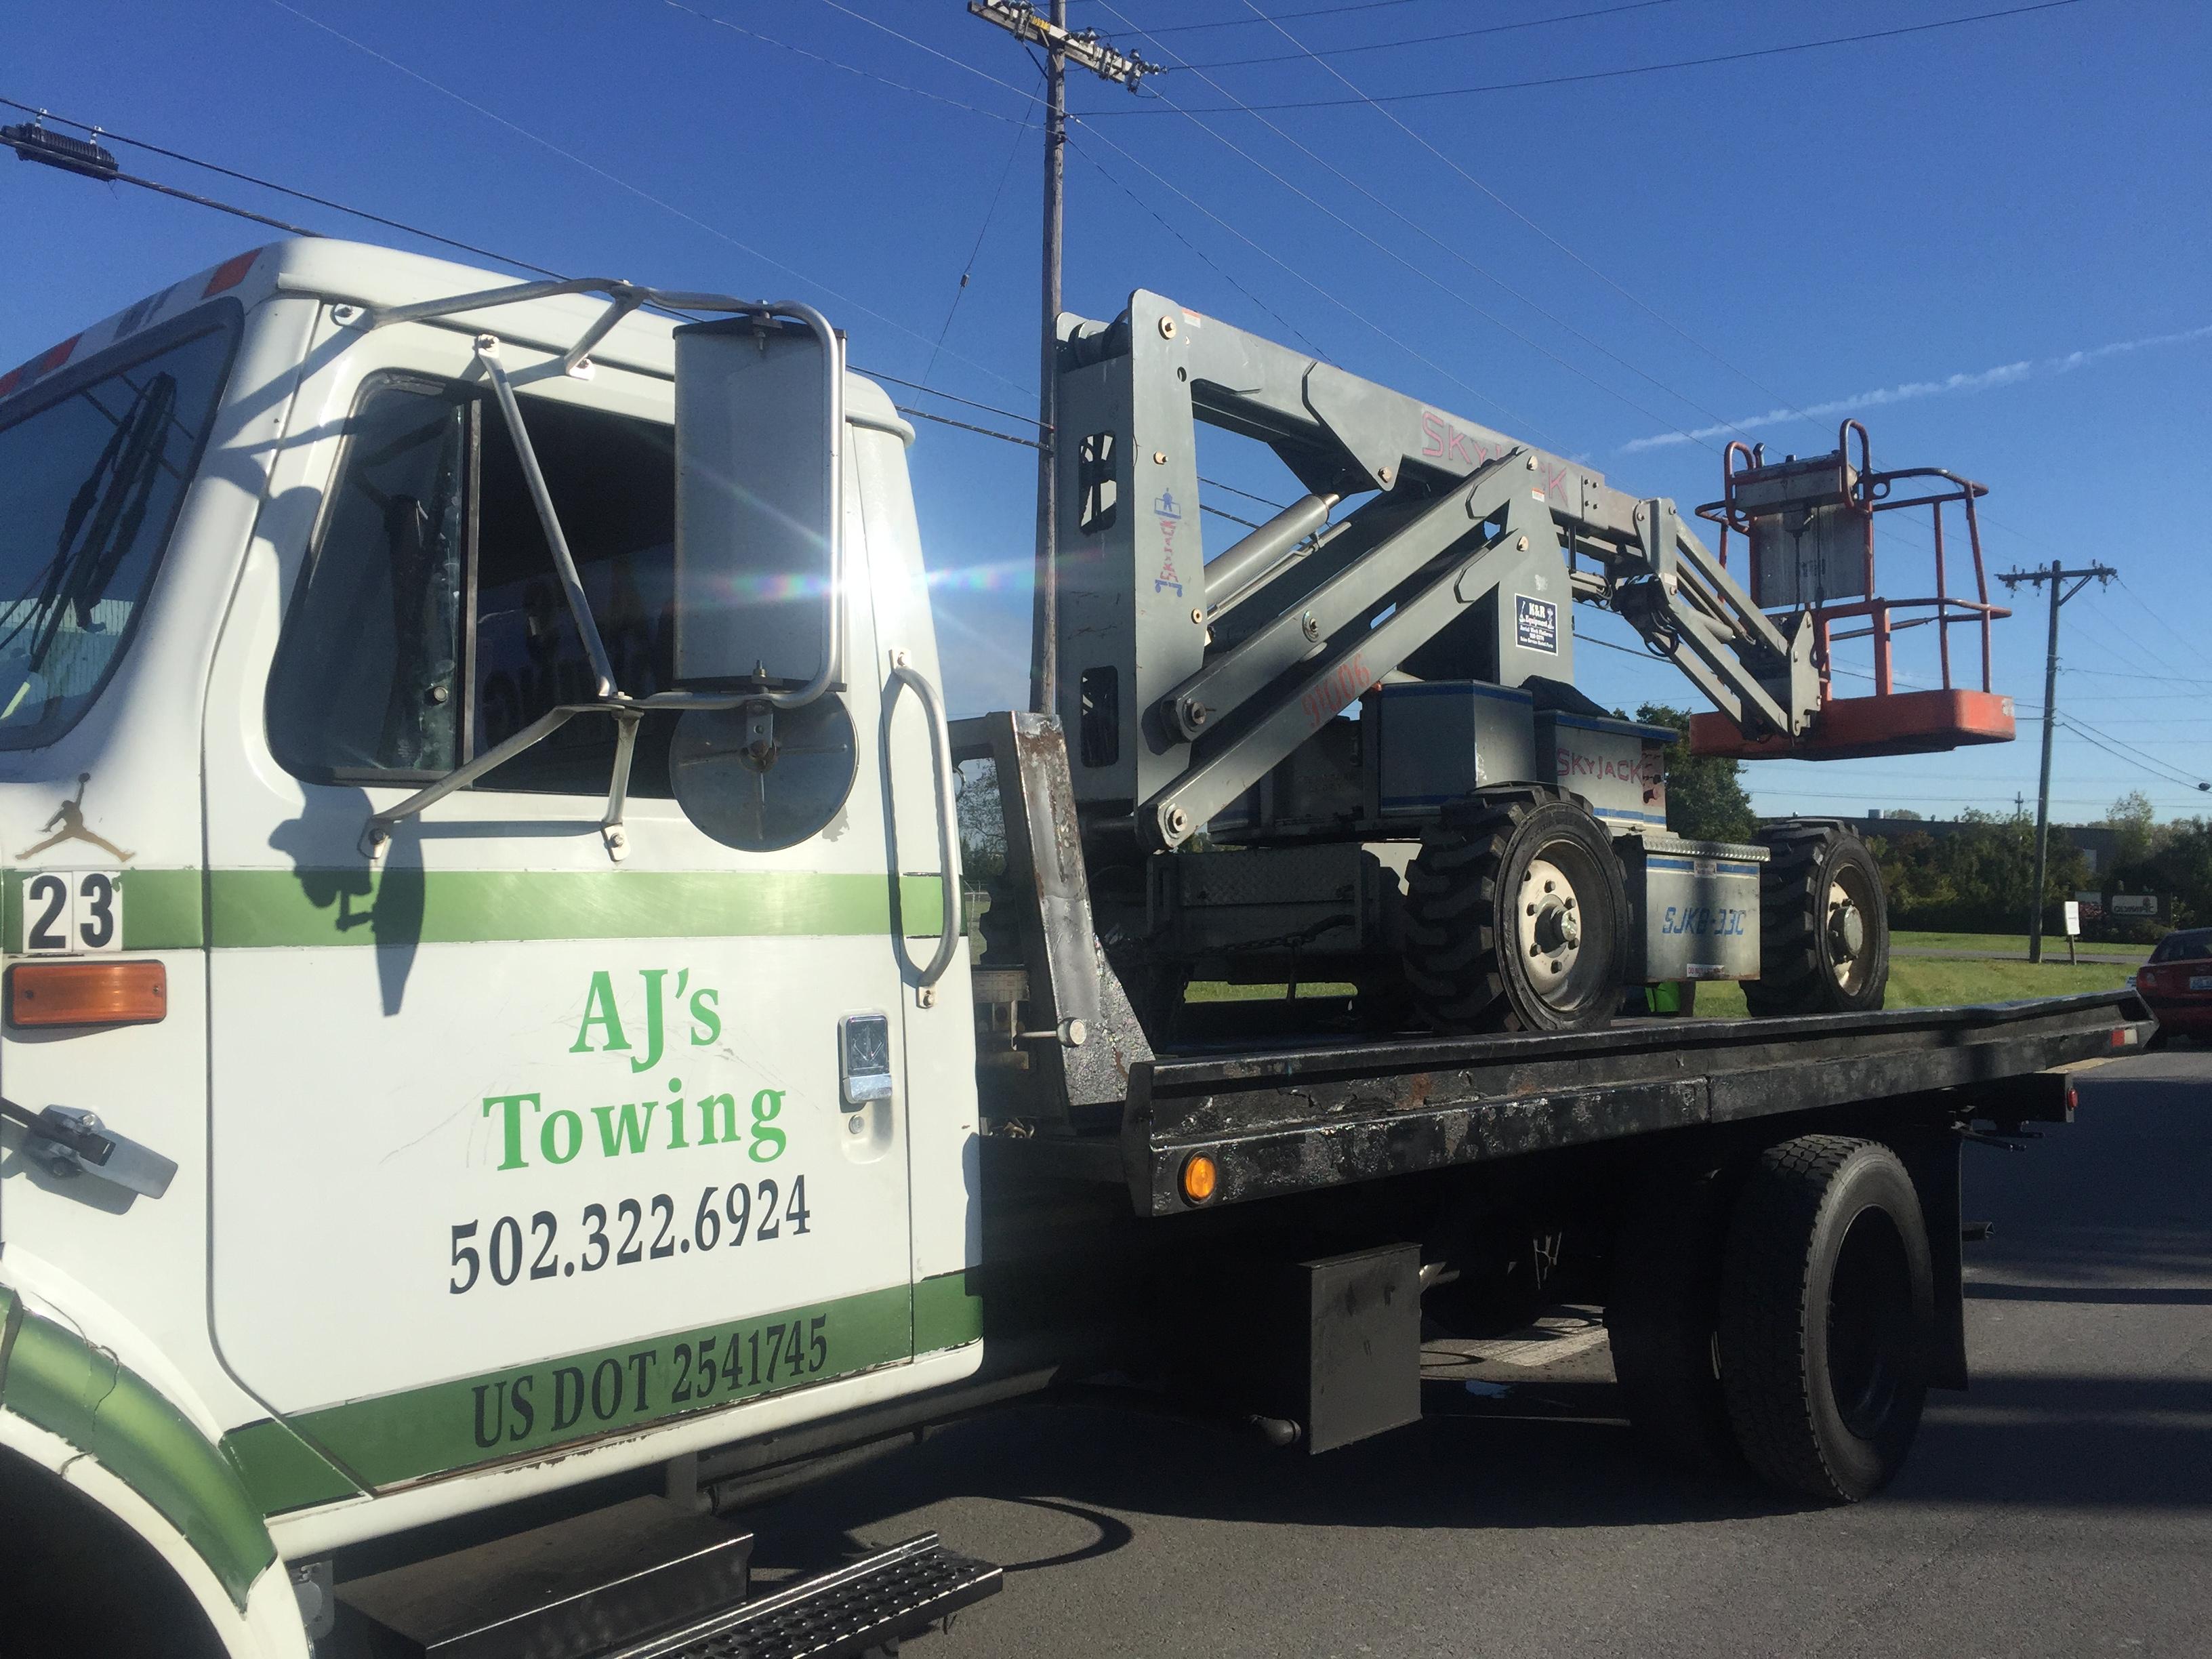 AJ's Towing Service image 30